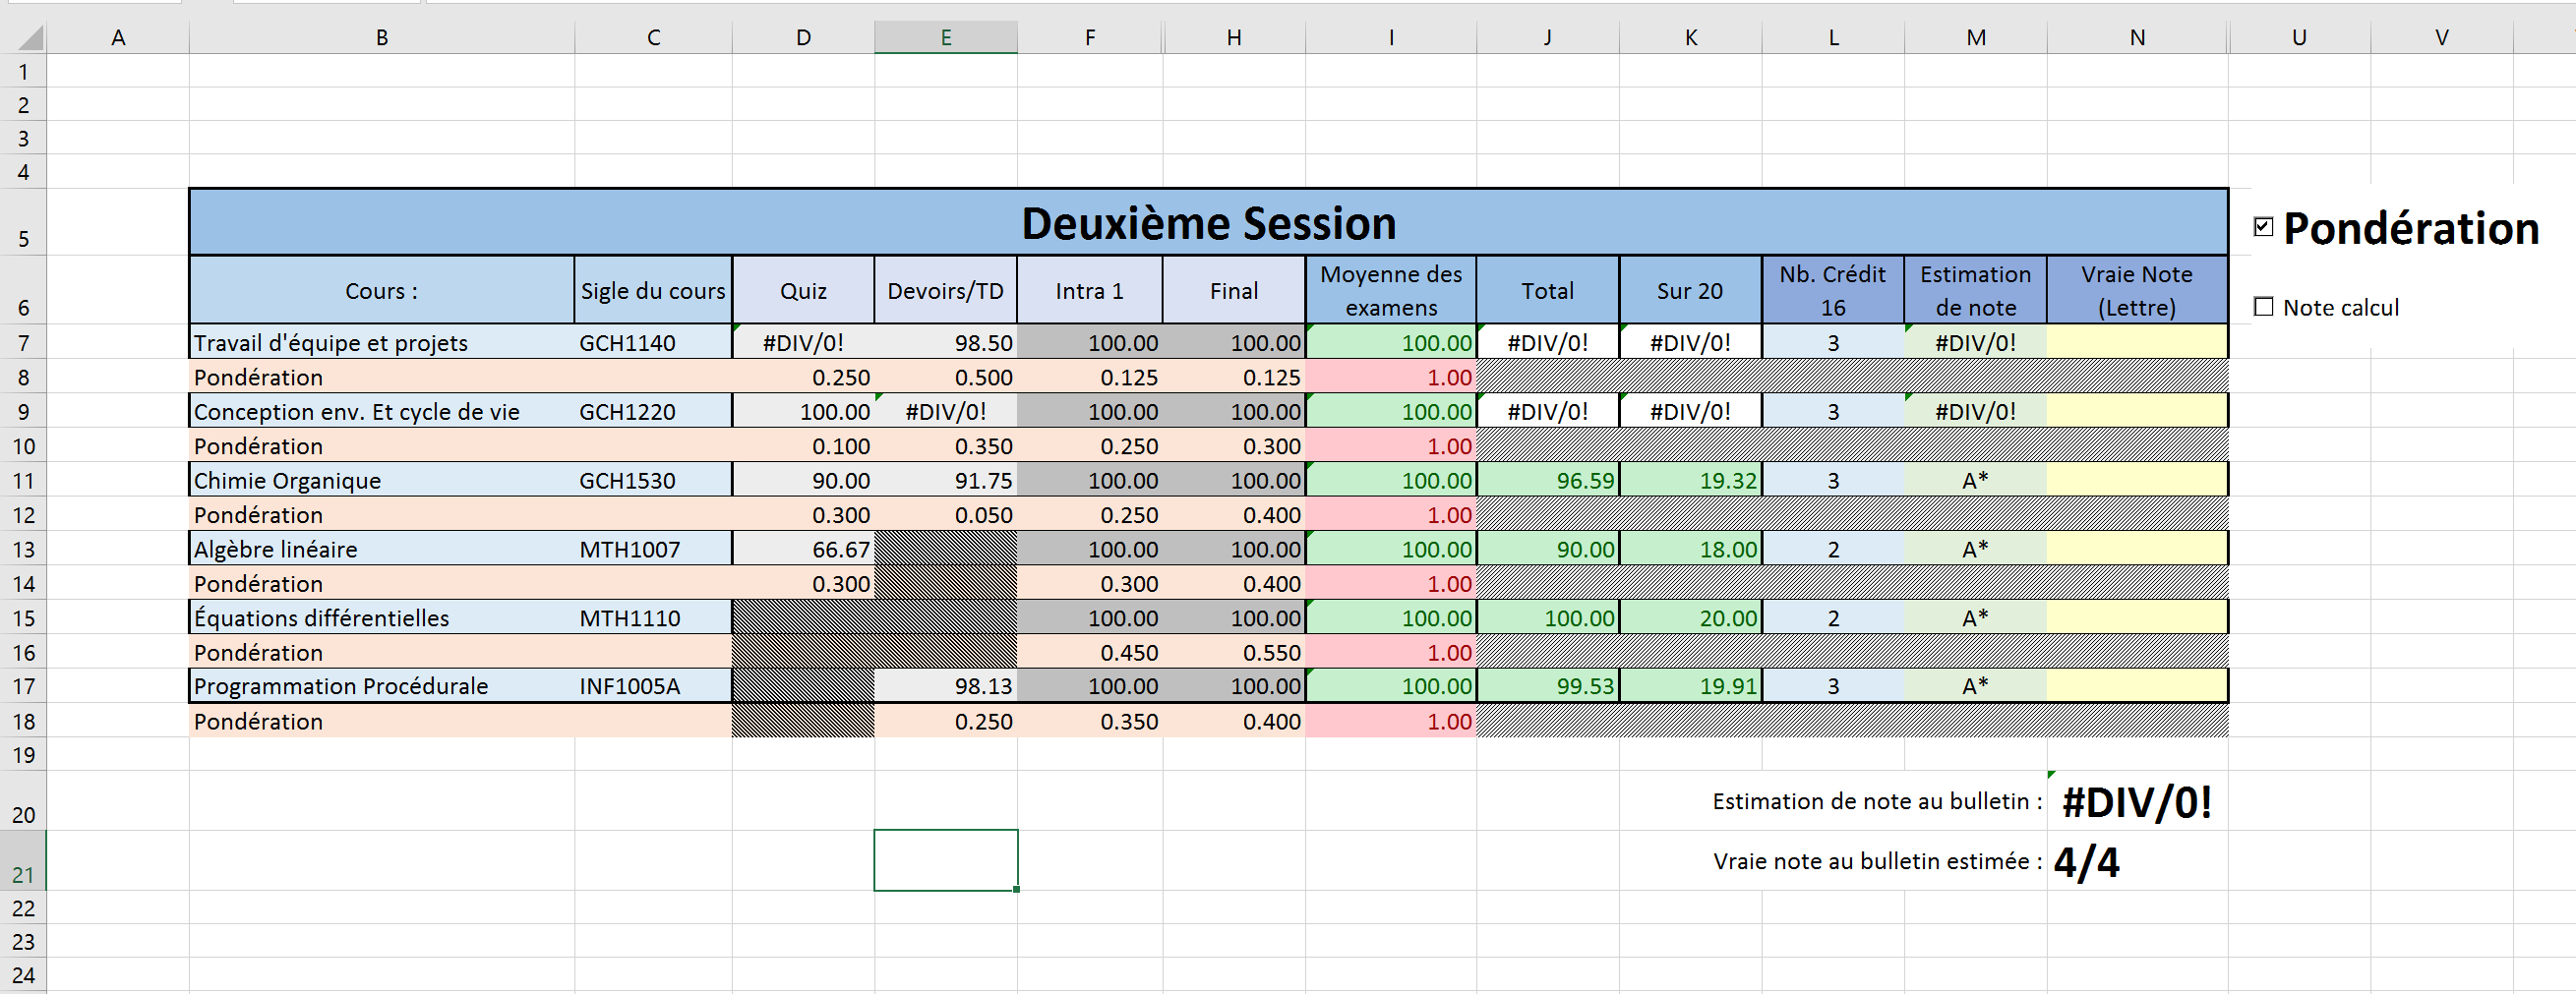 Gp Calculator Spreadsheet Regarding Grades Spreadsheet And Gpa Calculator  Album On Imgur